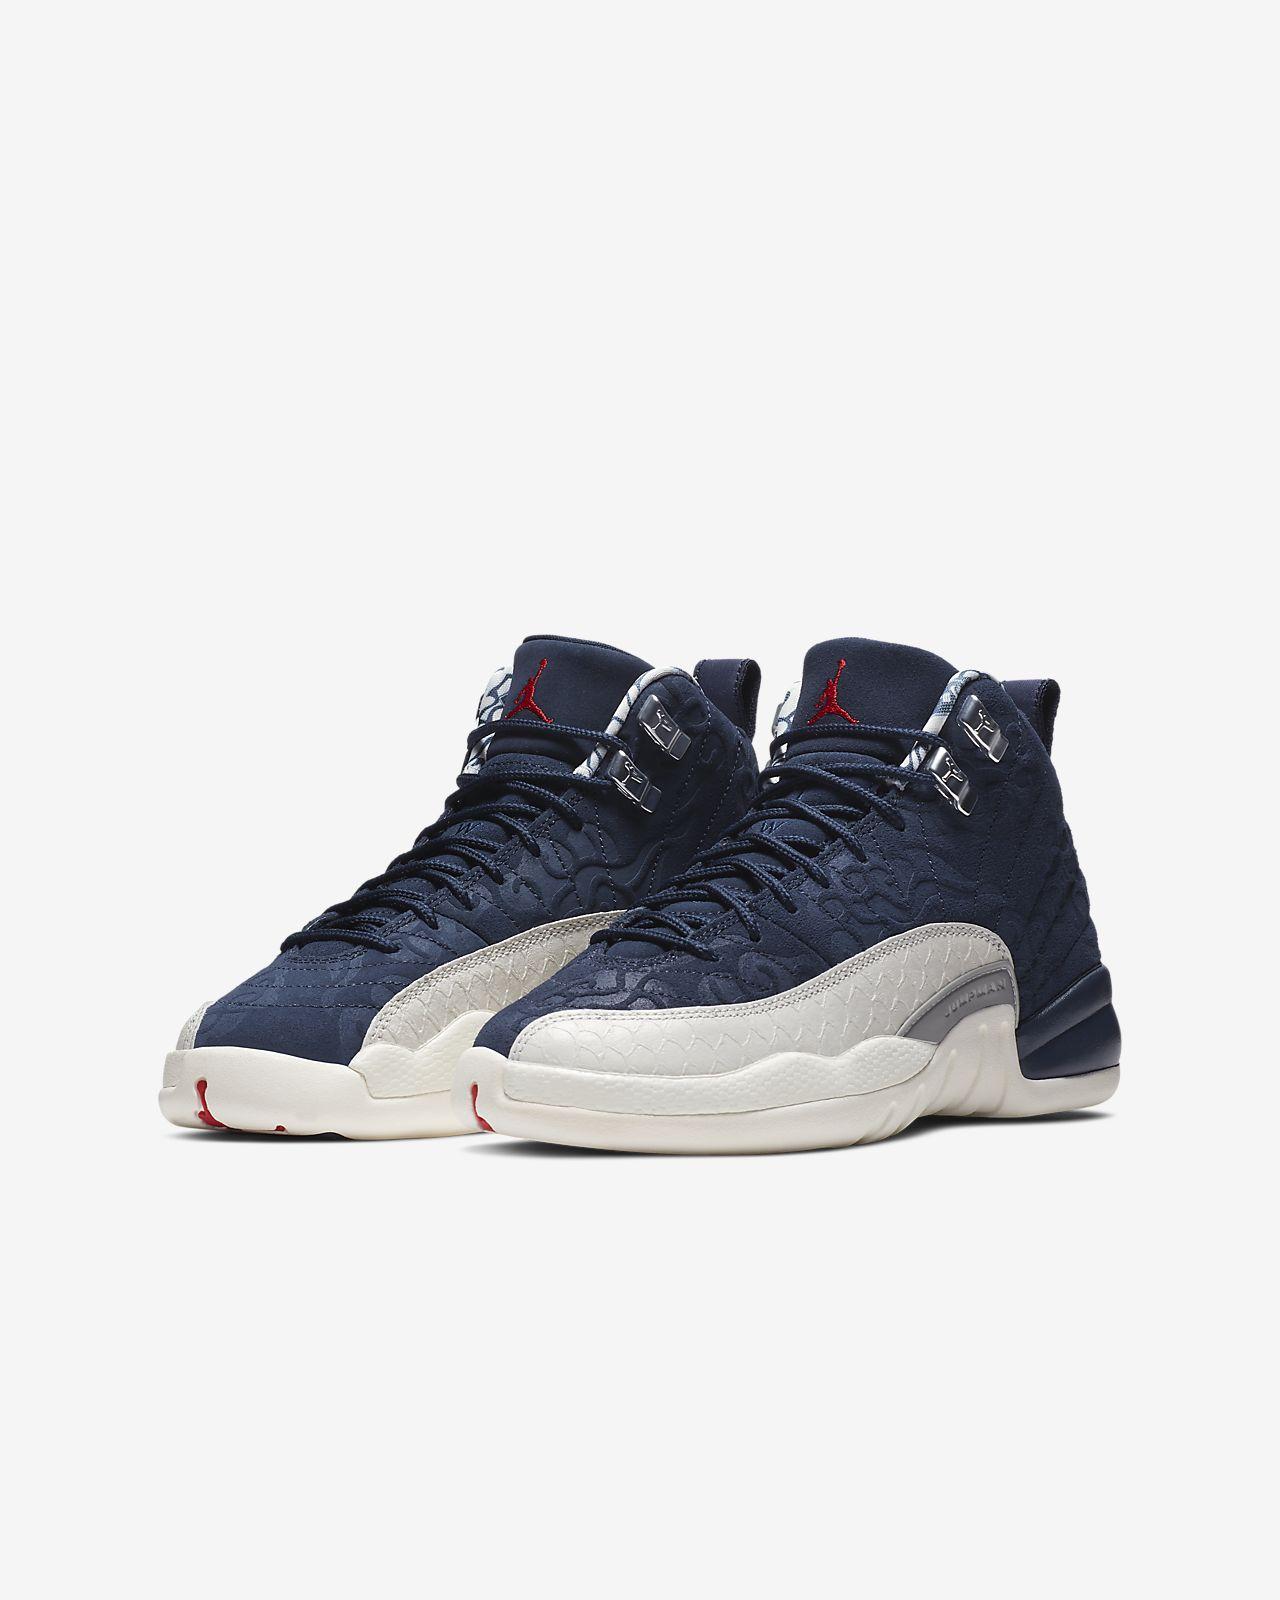 496de53c8a6ab6 Air Jordan 12 Retro Premium Older Kids  Shoe. Nike.com ID